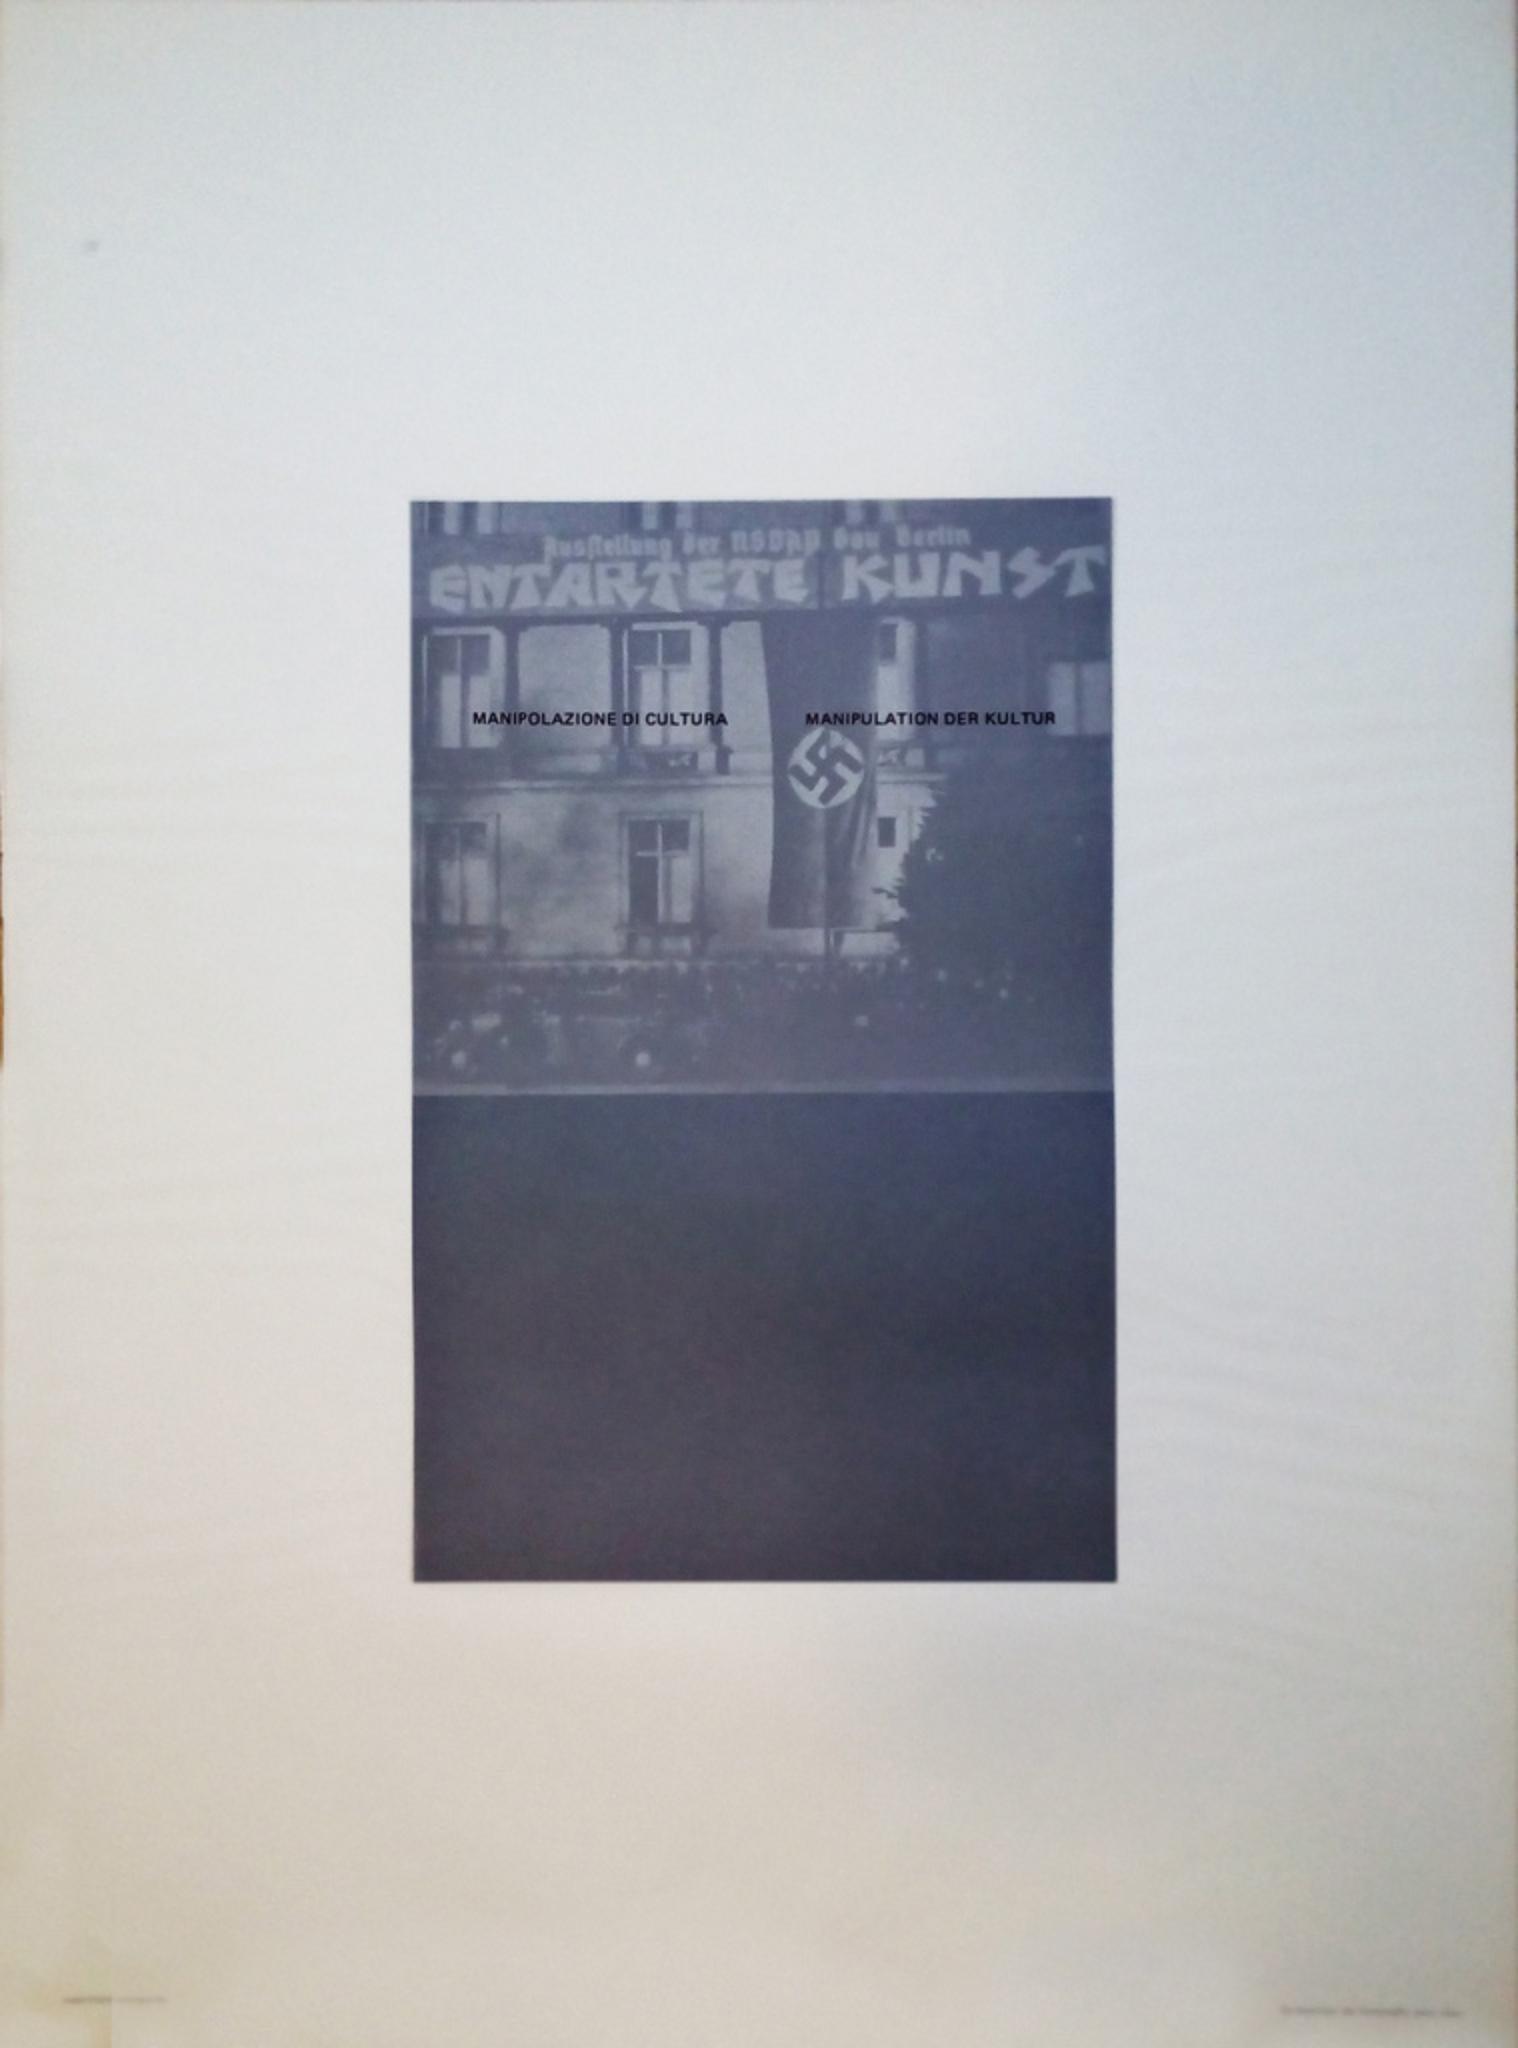 Sopprimono Avanguardie - Original Photolithograph by Fabio Mauri - 1976